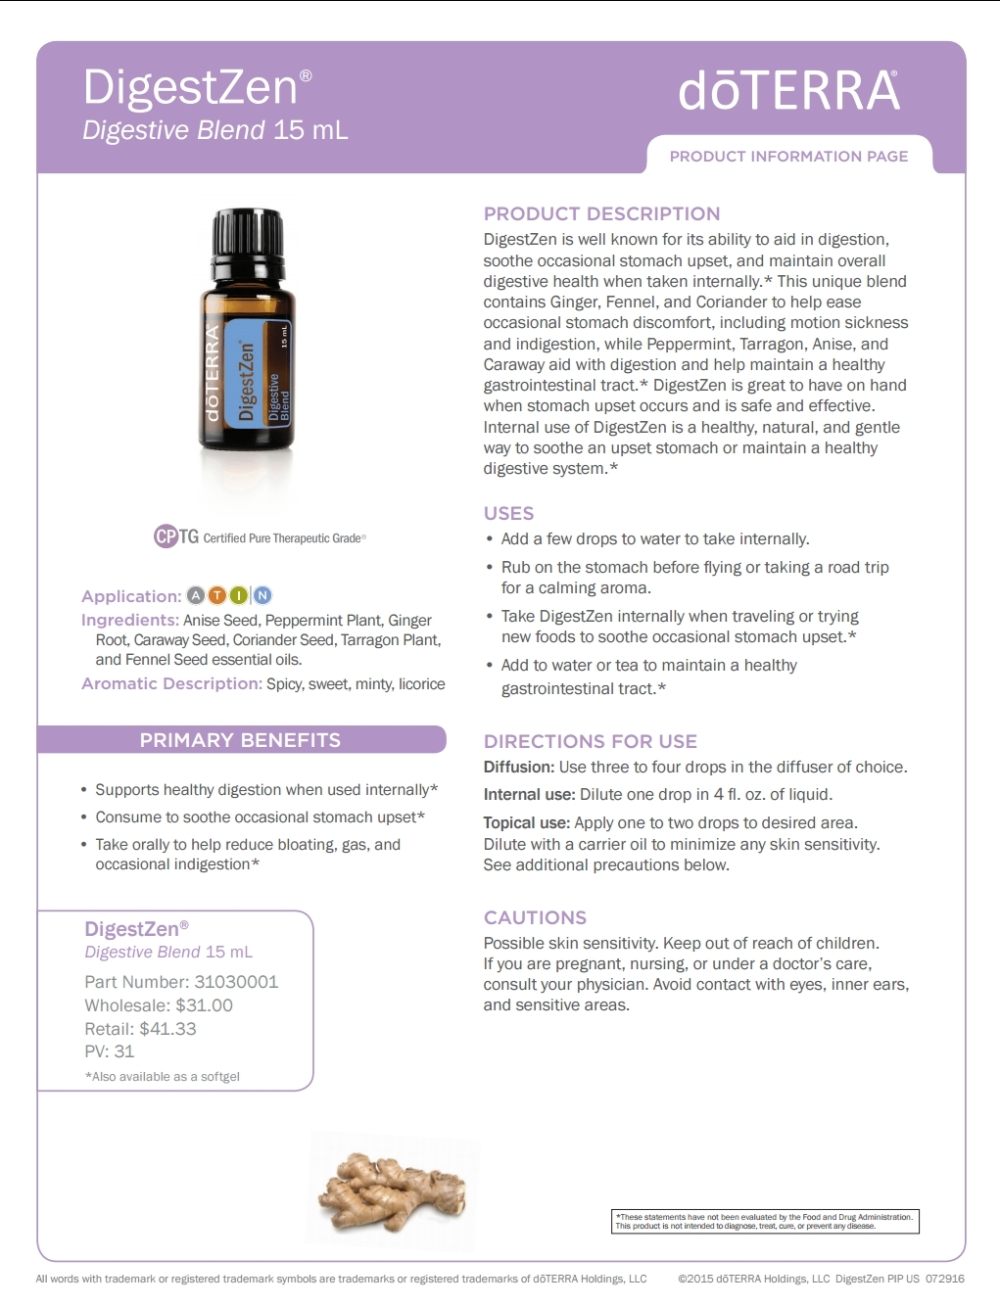 DigestZen Product Profile